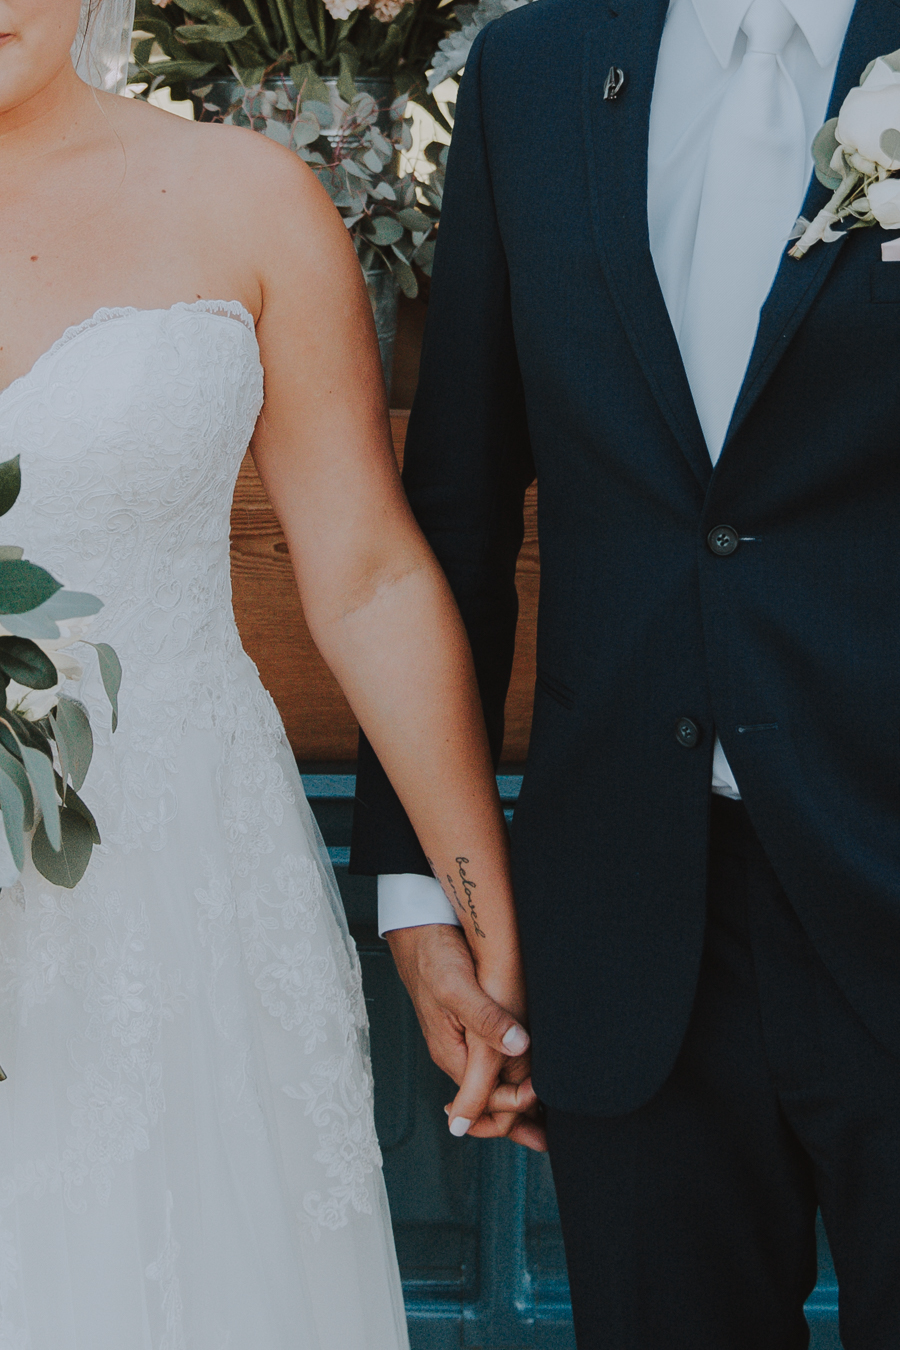 Harborside Chapel Wedding Clearwater Affordable Tampa Venues BHLDN Palm Harbor Safety Harbor Resort and Spa Wedding Malindy Elene Bridal St Pete Wedding Photographer Tampa Wedding Photographer-108.jpg